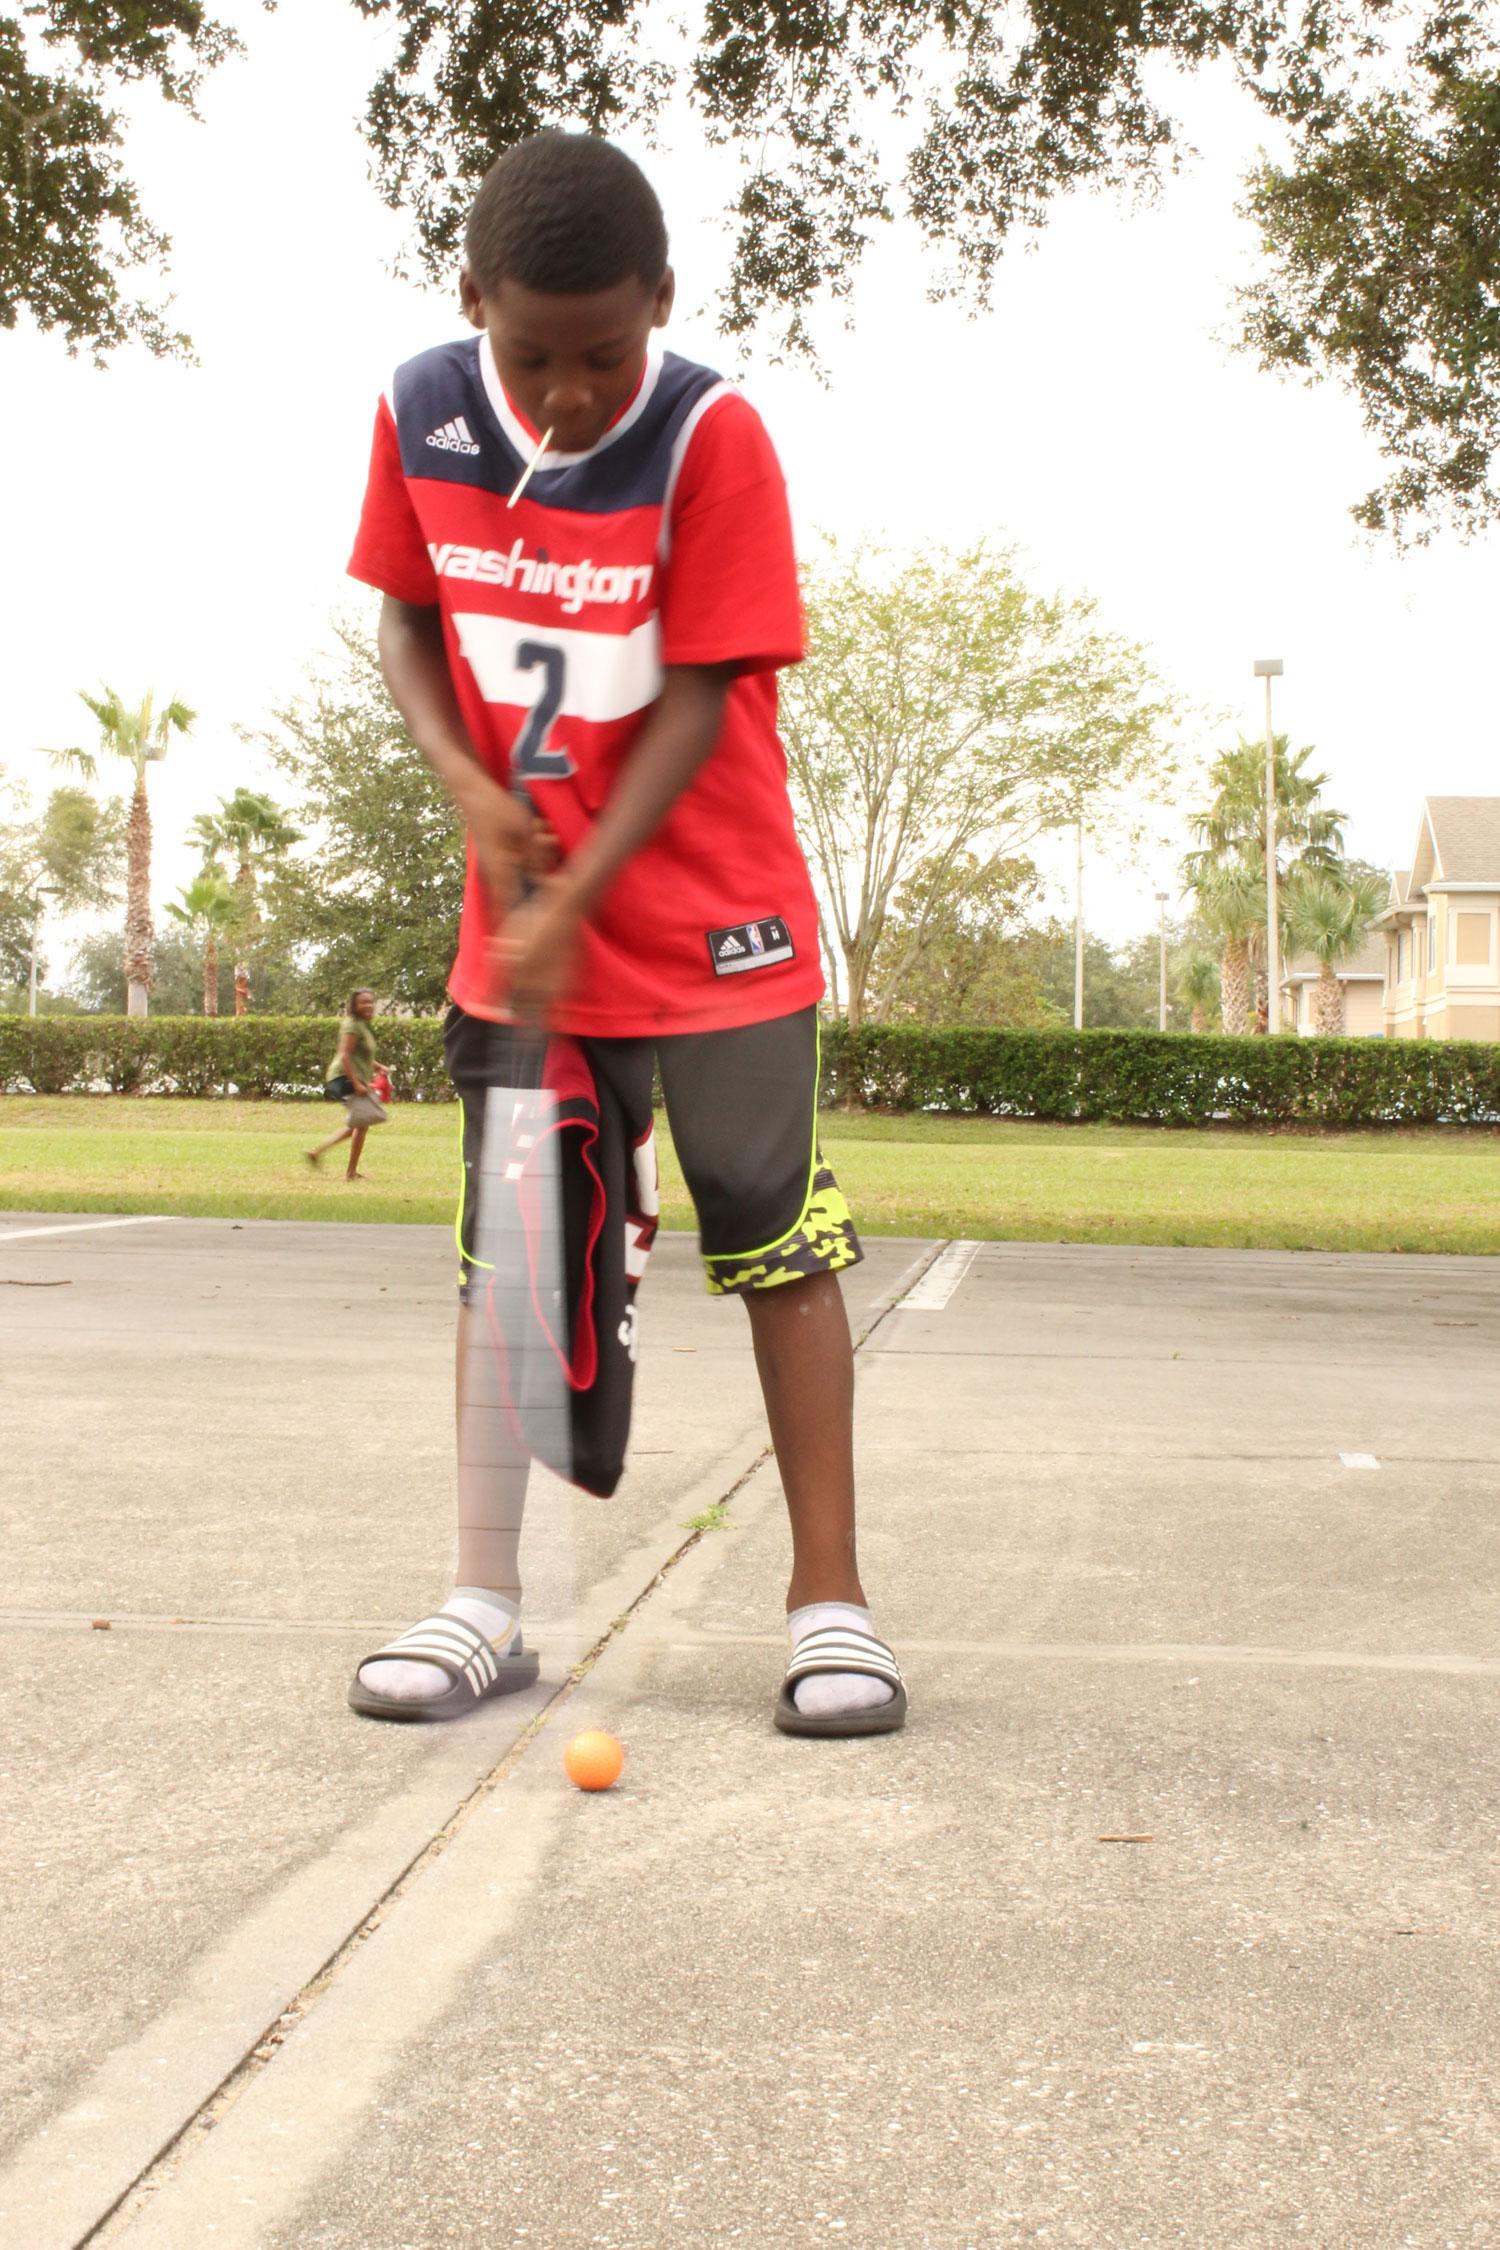 ff-golf-2.jpg